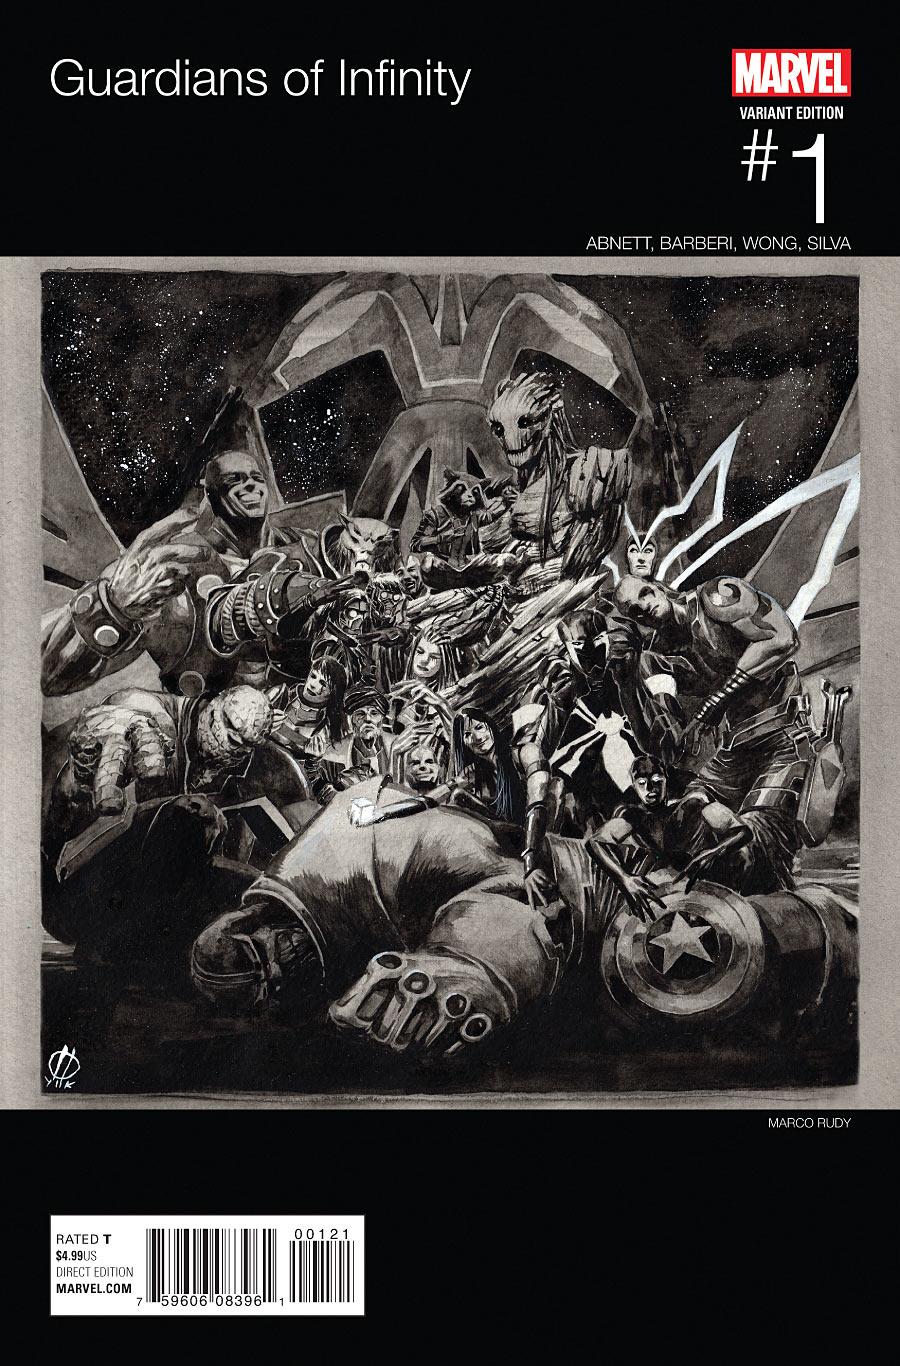 Guardians of Infinity Vol 1 1 Hip-Hop Variant.jpg